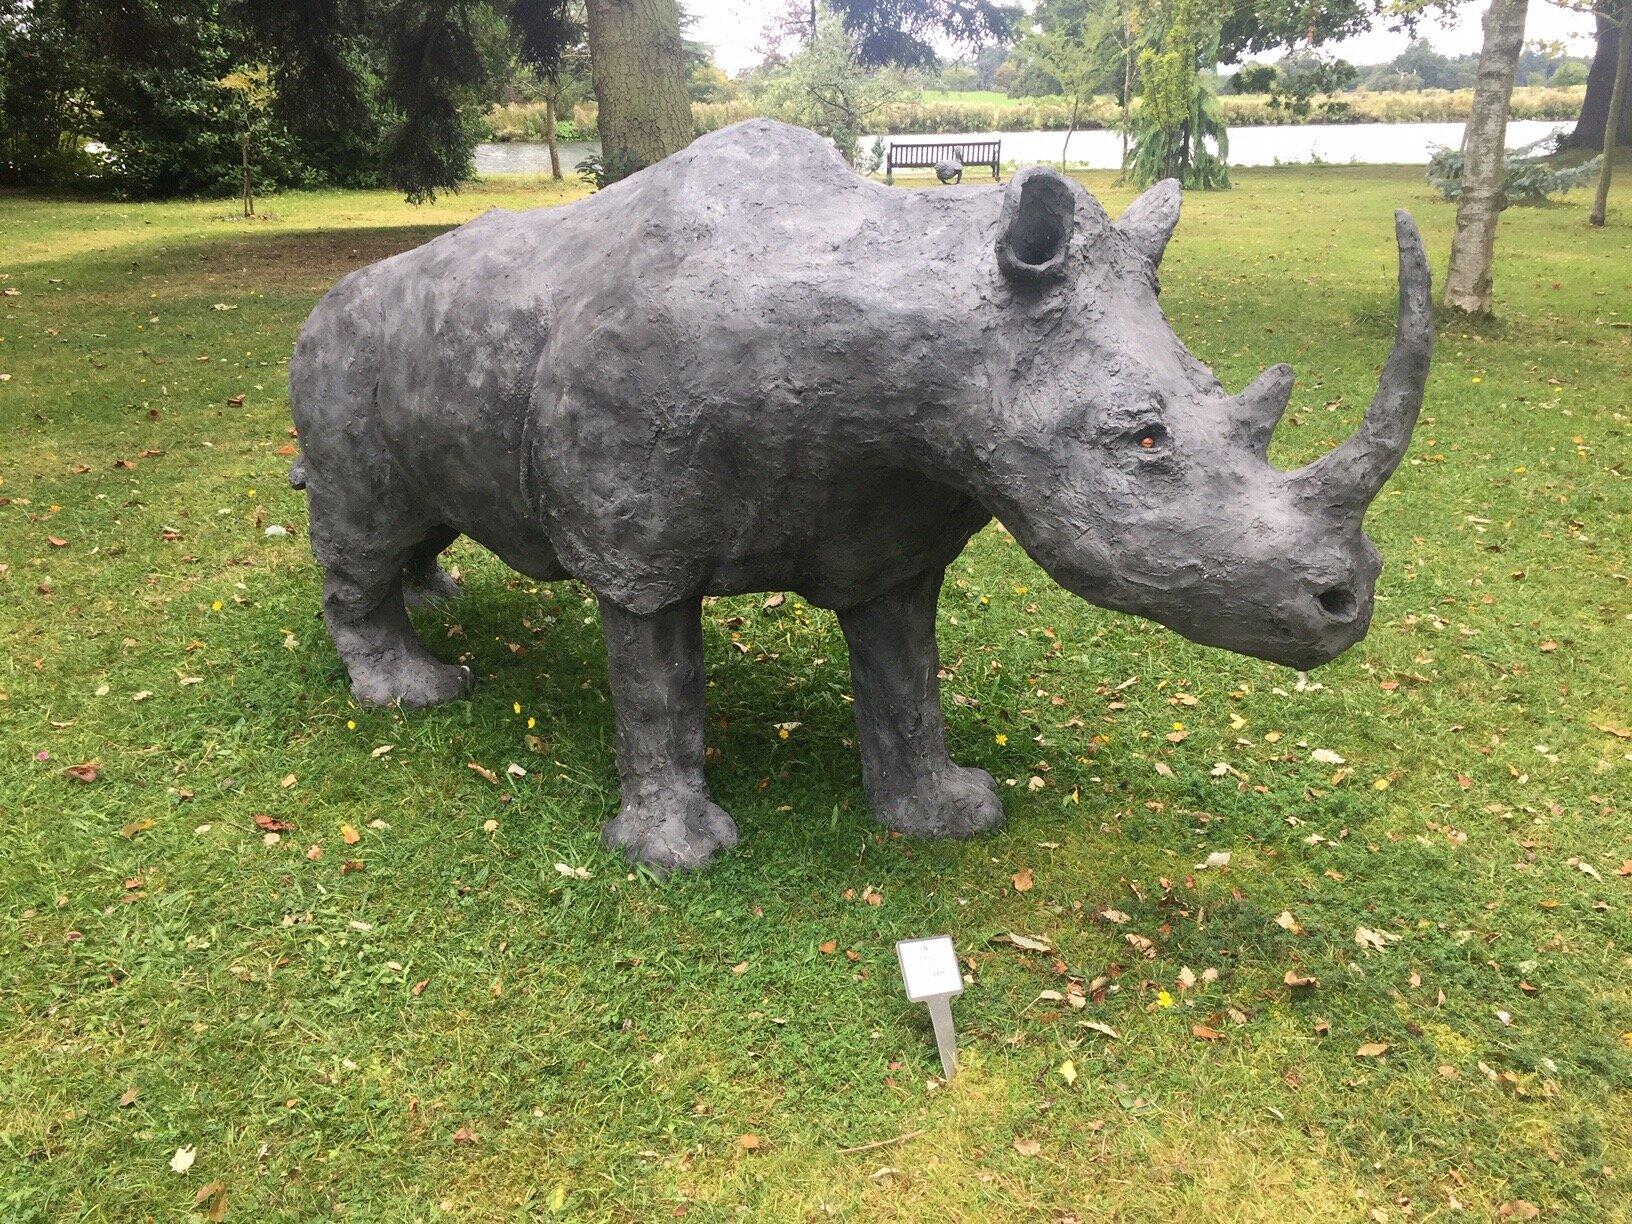 Rowena the rhino